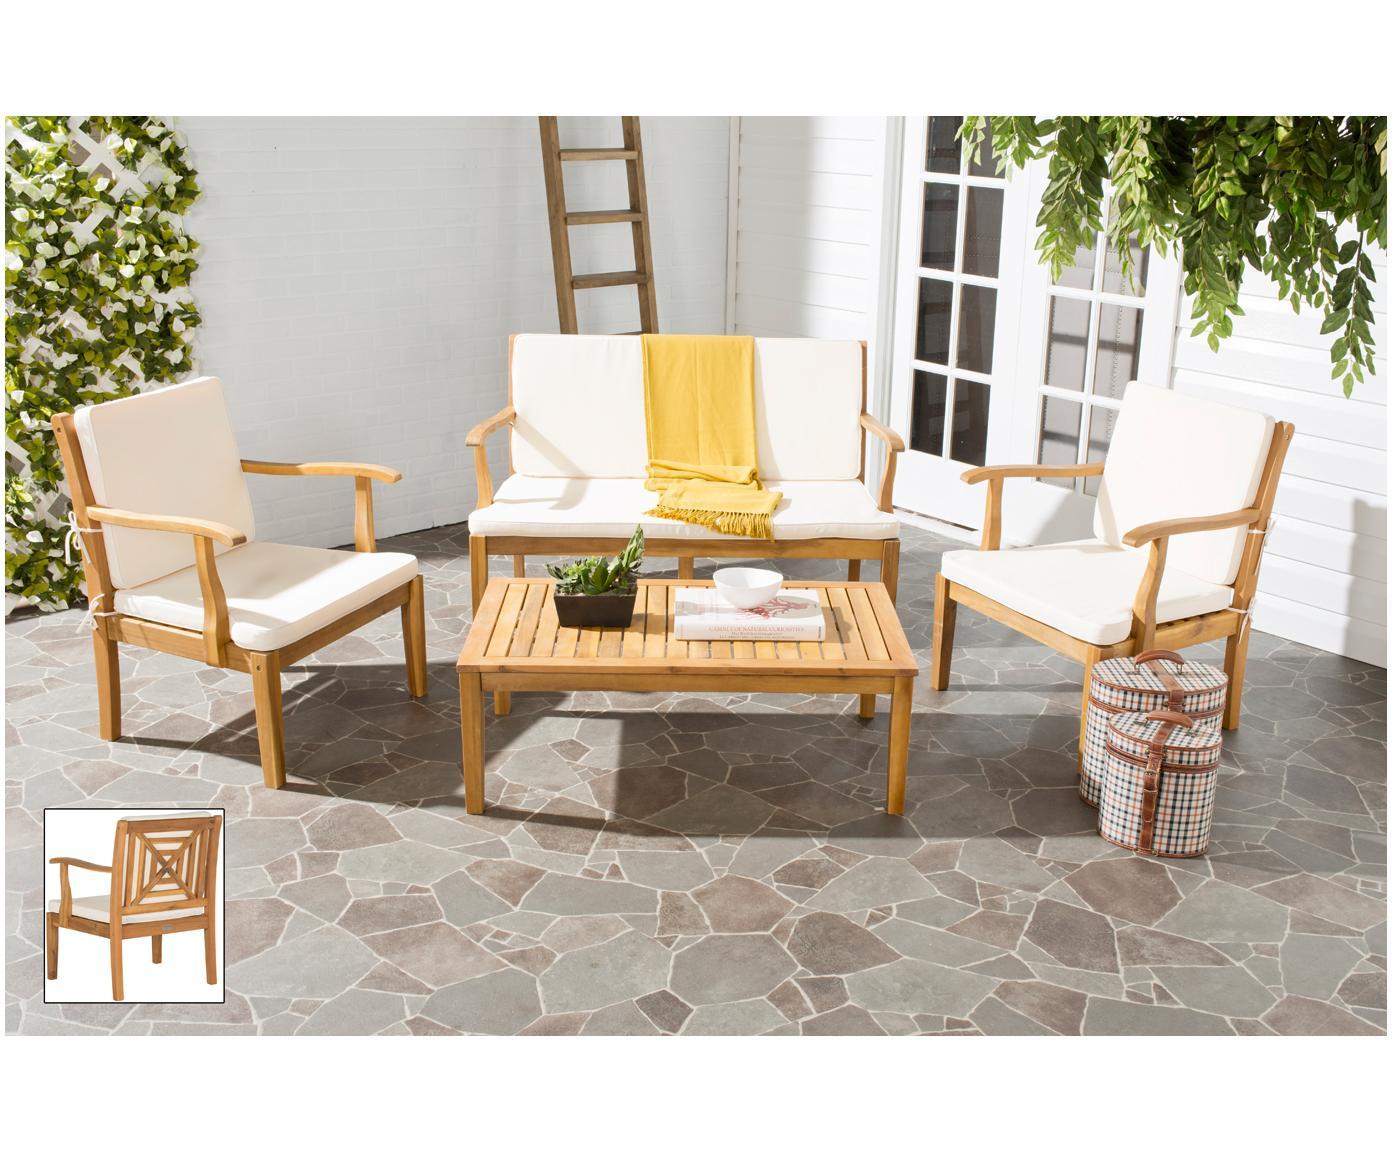 Garten-Lounge-Set Lugano, 4-tlg., Gestell: Akazienholz, geölt, Bezug: Polyester, Akazienholz, Ecru, Sondergrößen